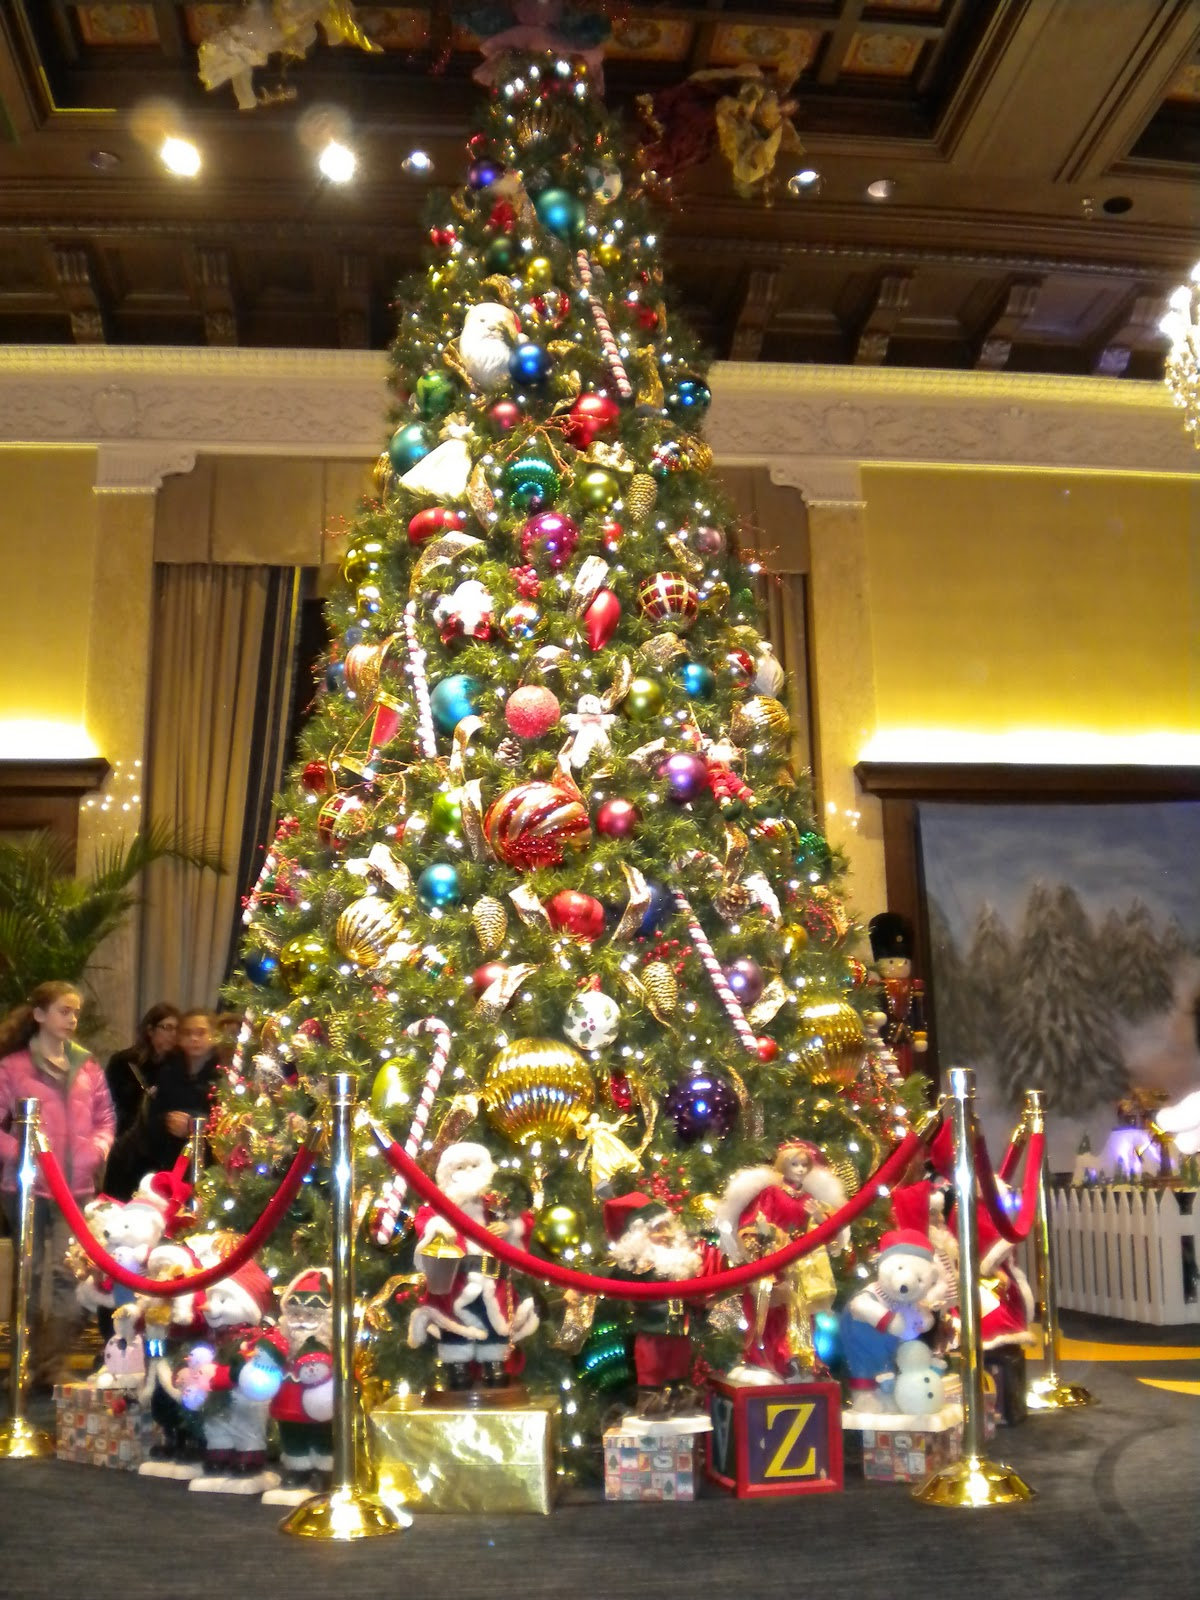 juleaften i tyskland